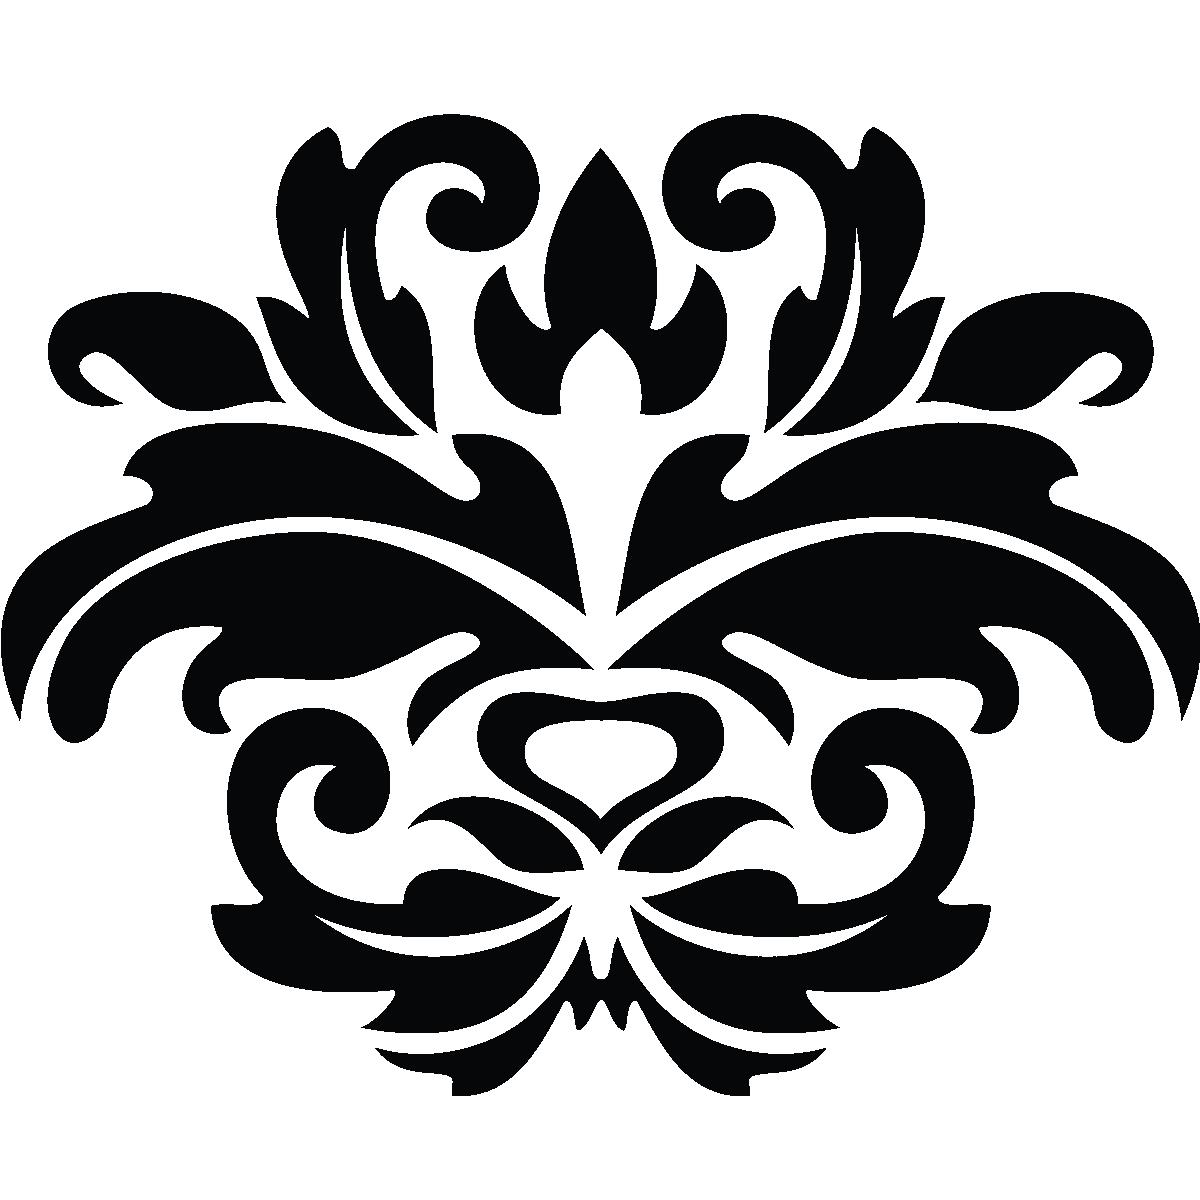 Stickers Muraux Design Sticker Mural Fleur Art Deco Ambiance